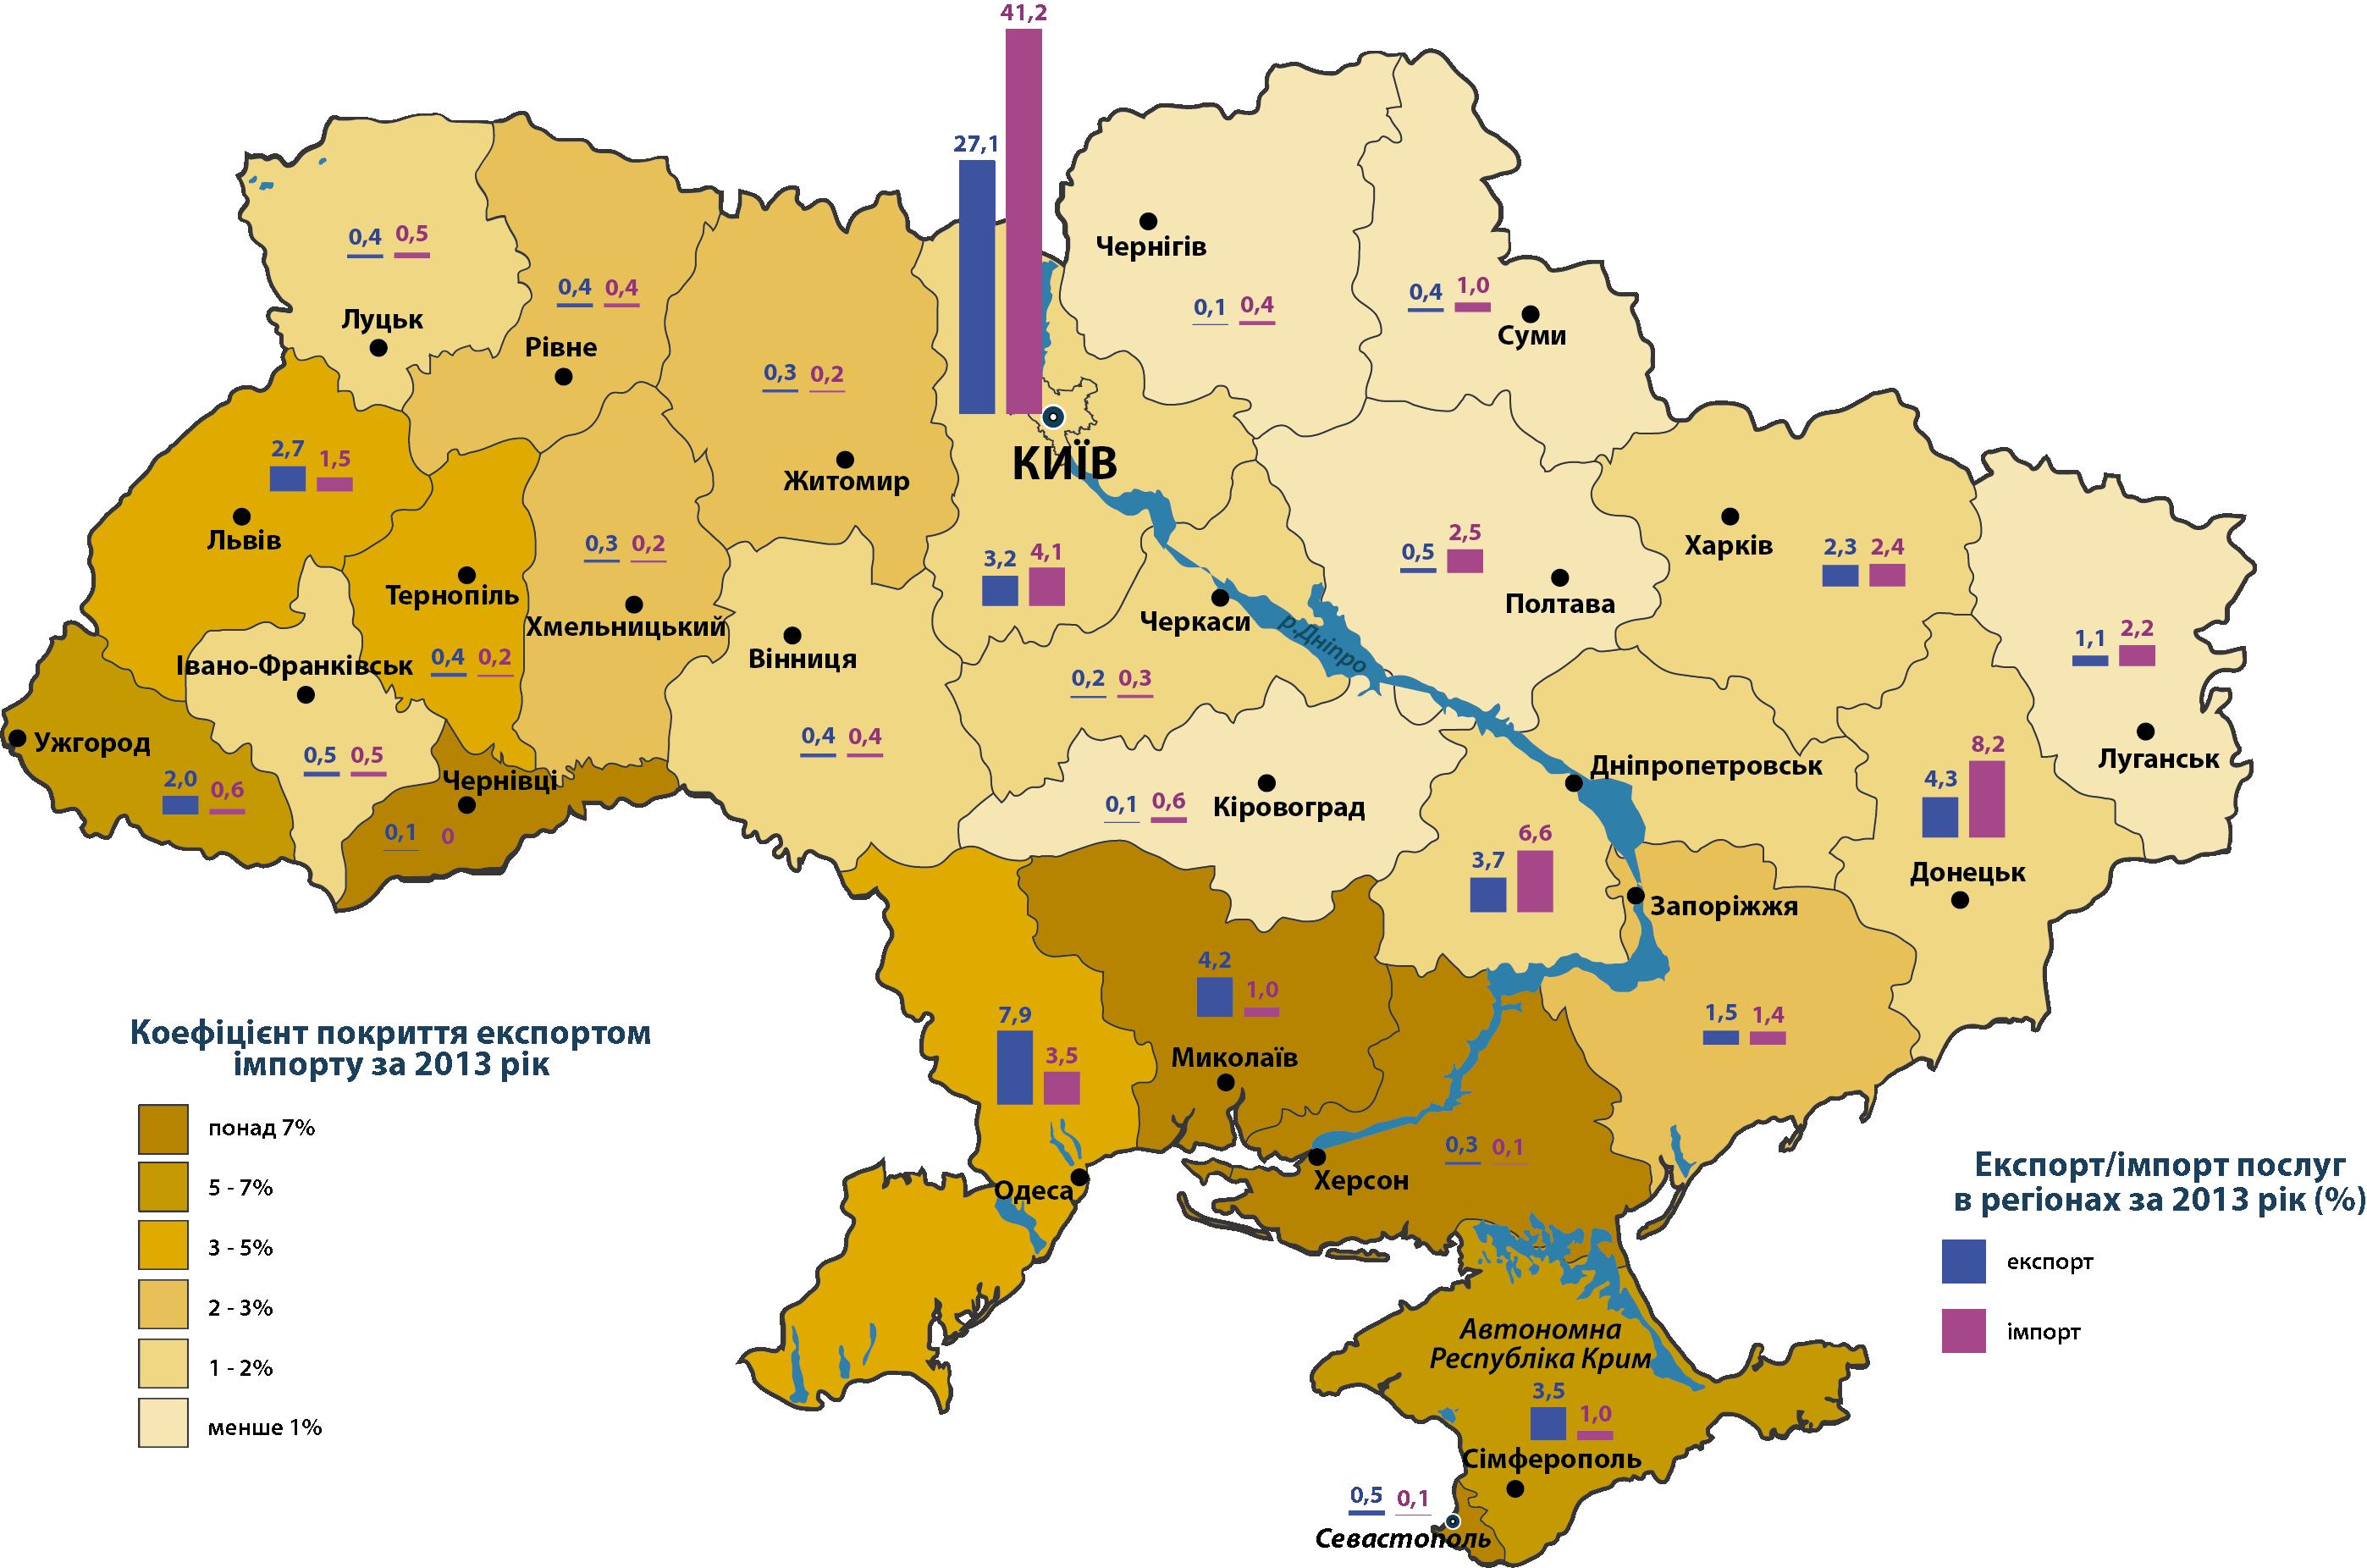 Экспорт/импорт услуг в Украине